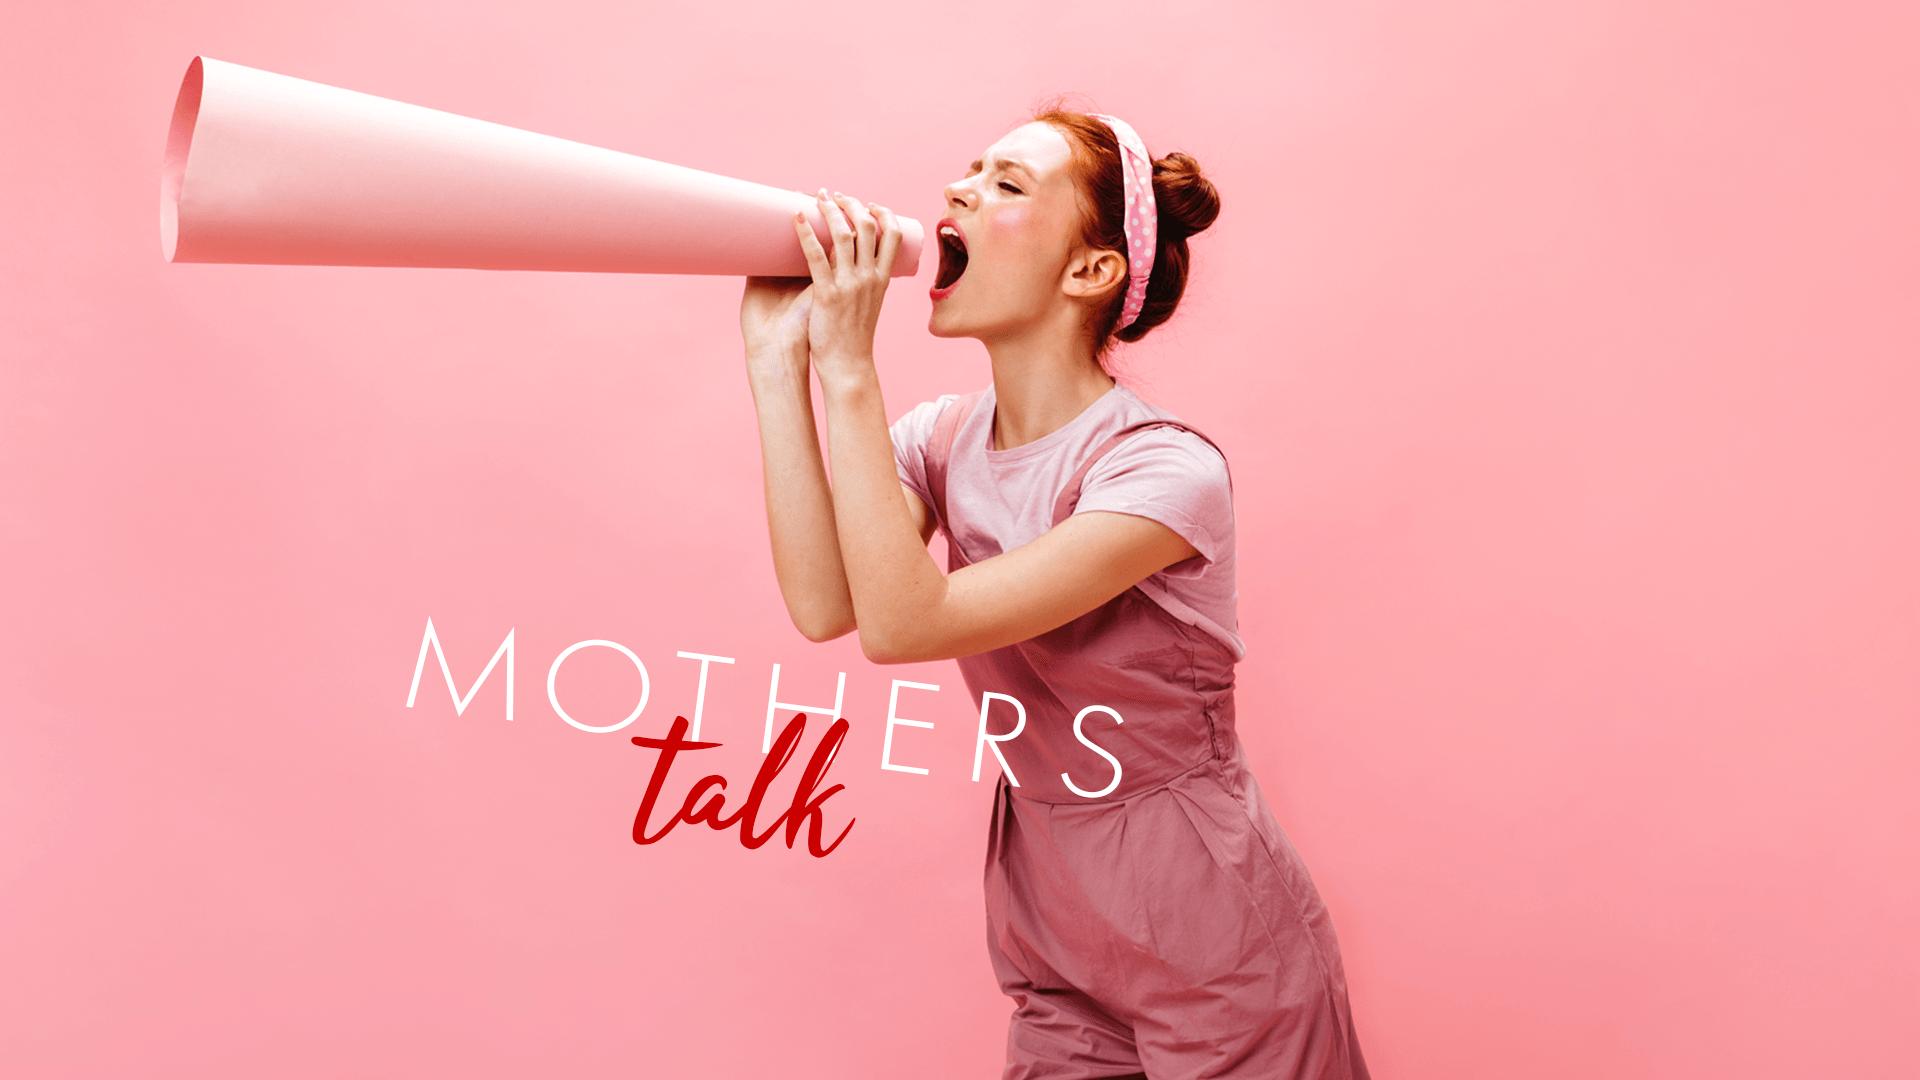 MothersTalk